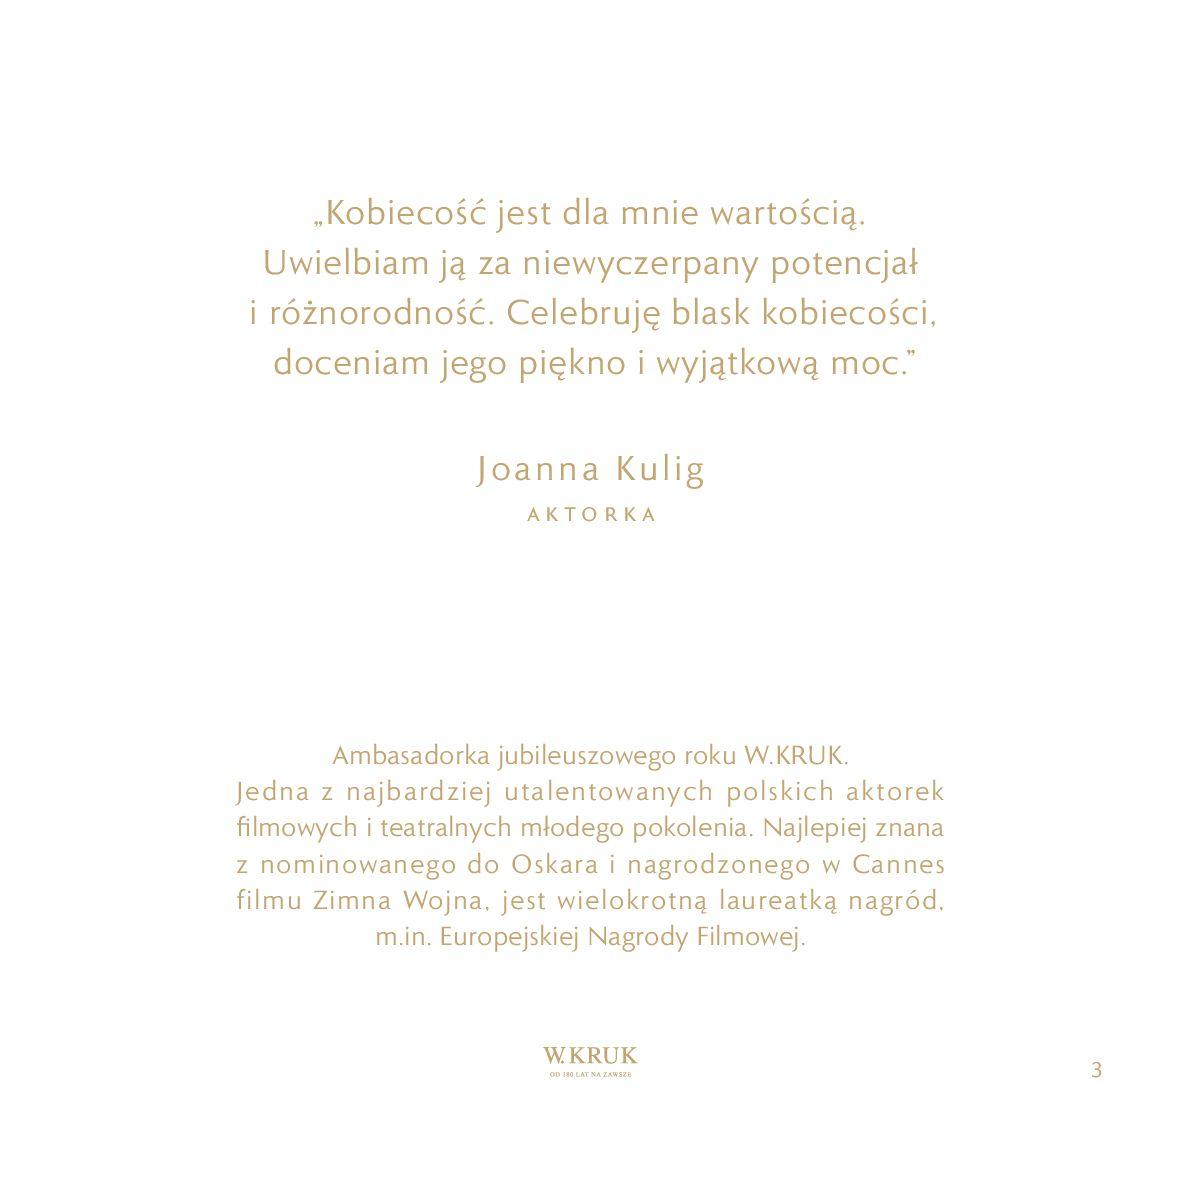 Gazetka W. KRUK: Katalog - Kolekcja Blask 2021-02-17 page-4